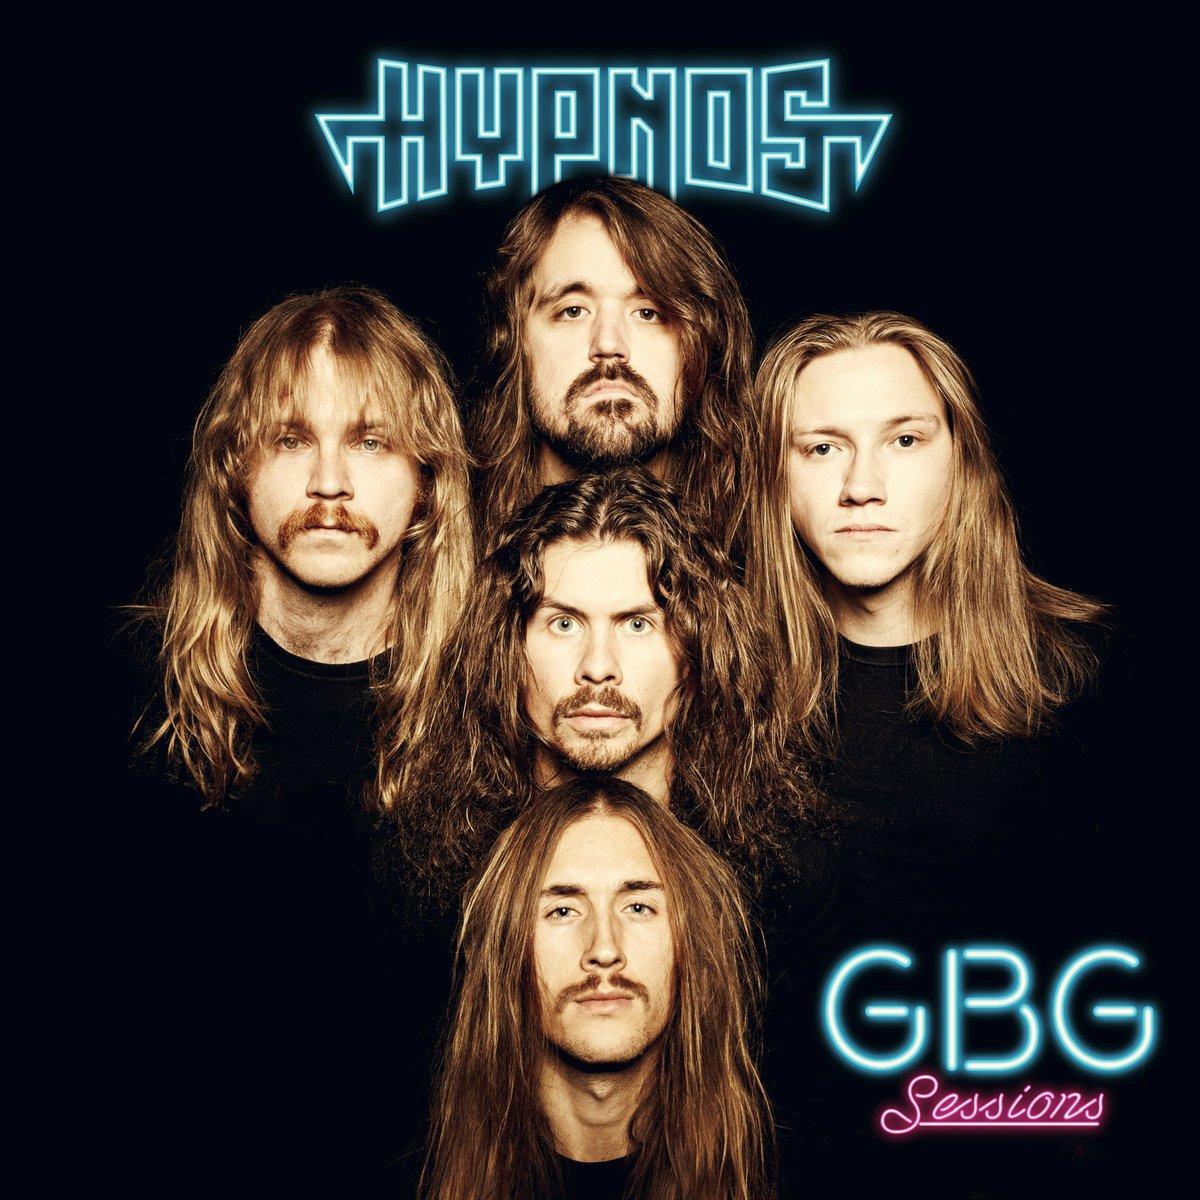 CD : Hypnos - Gbg Sessions (United Kingdom - Import)